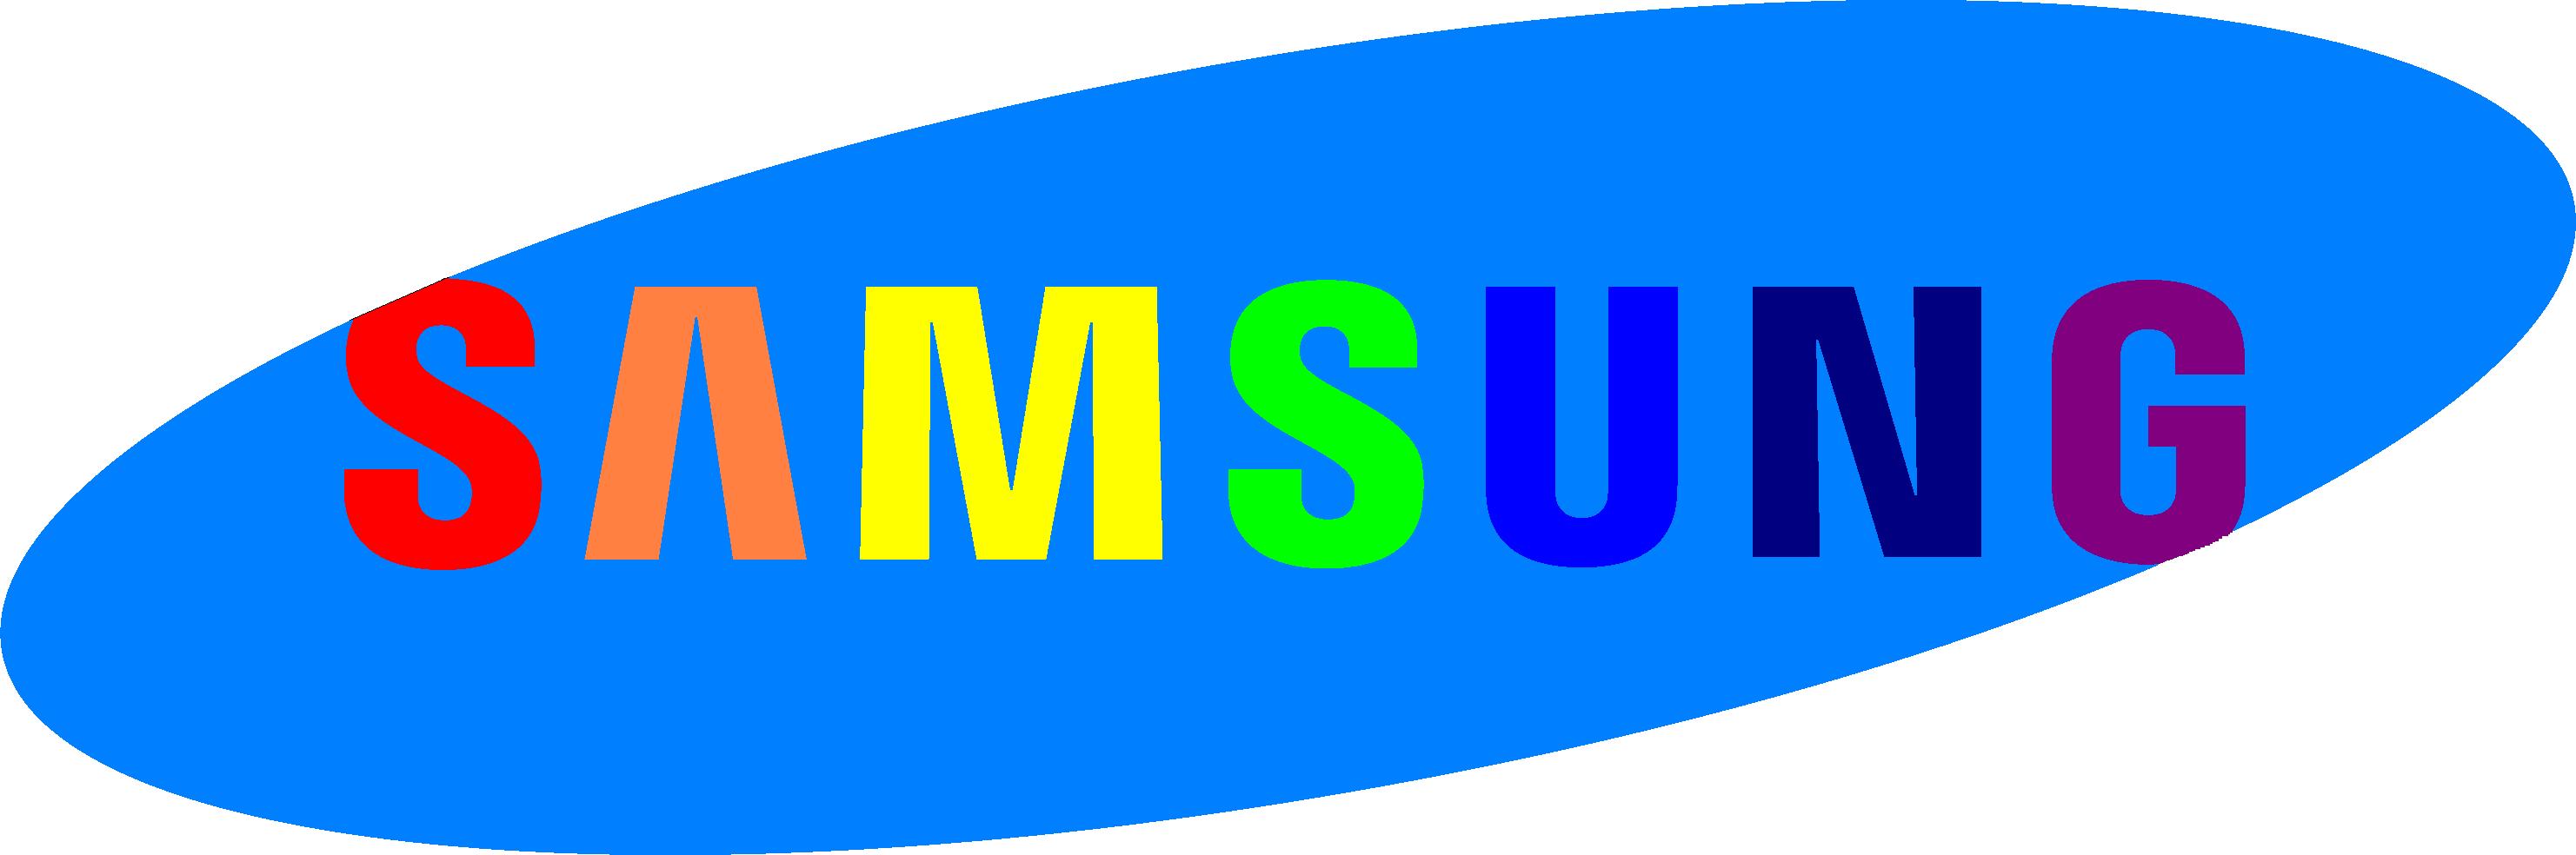 Logo samsung 7 màu